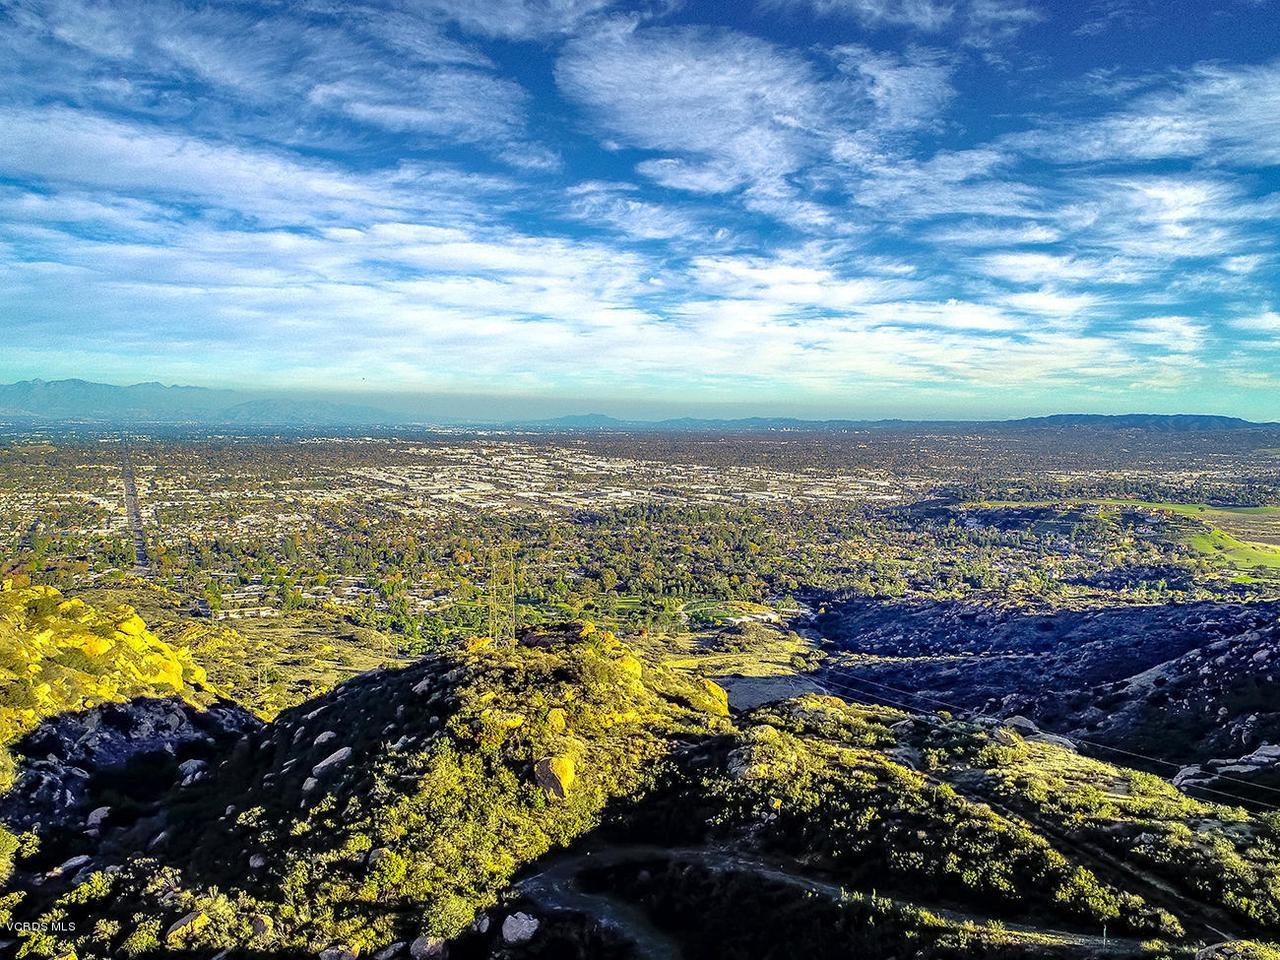 7868 MESA, Simi Valley, CA 93063 - Aerials-1